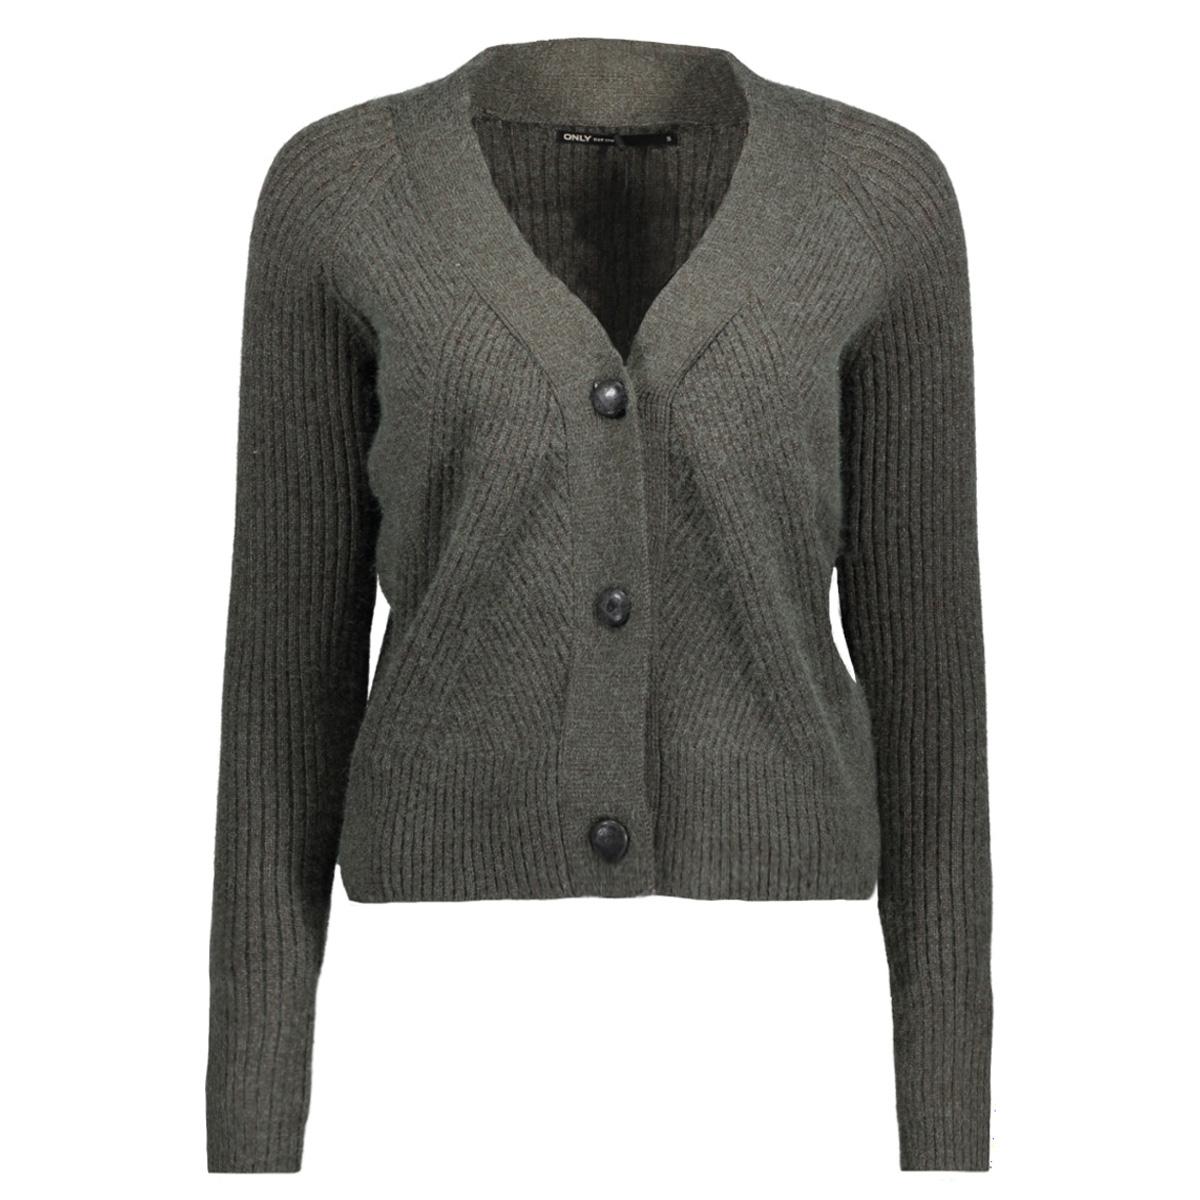 onlsmilla l/s button cardigan knt 15140086 only vest peat/w melange